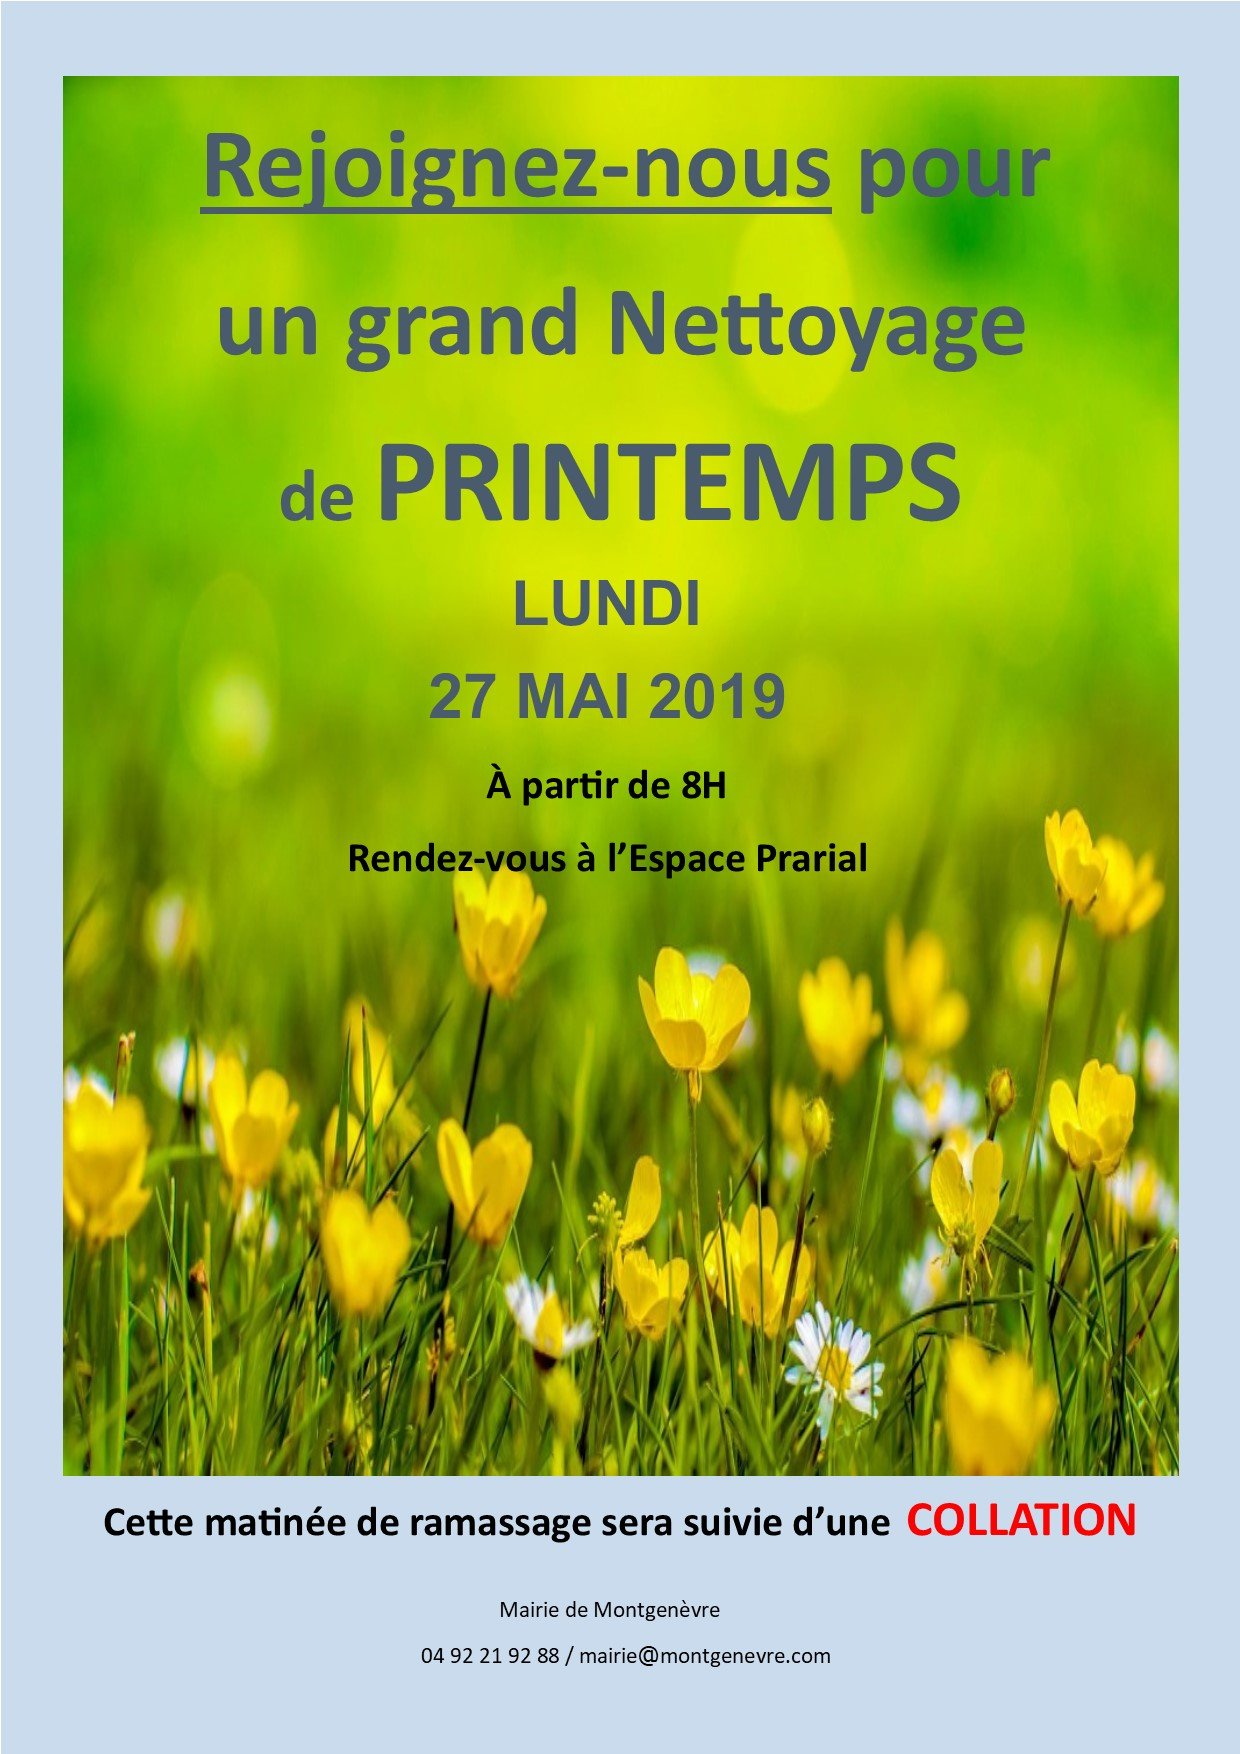 Grand nettoyage de Printemps - Lundi 27 mai 2019 - Montgenèvre